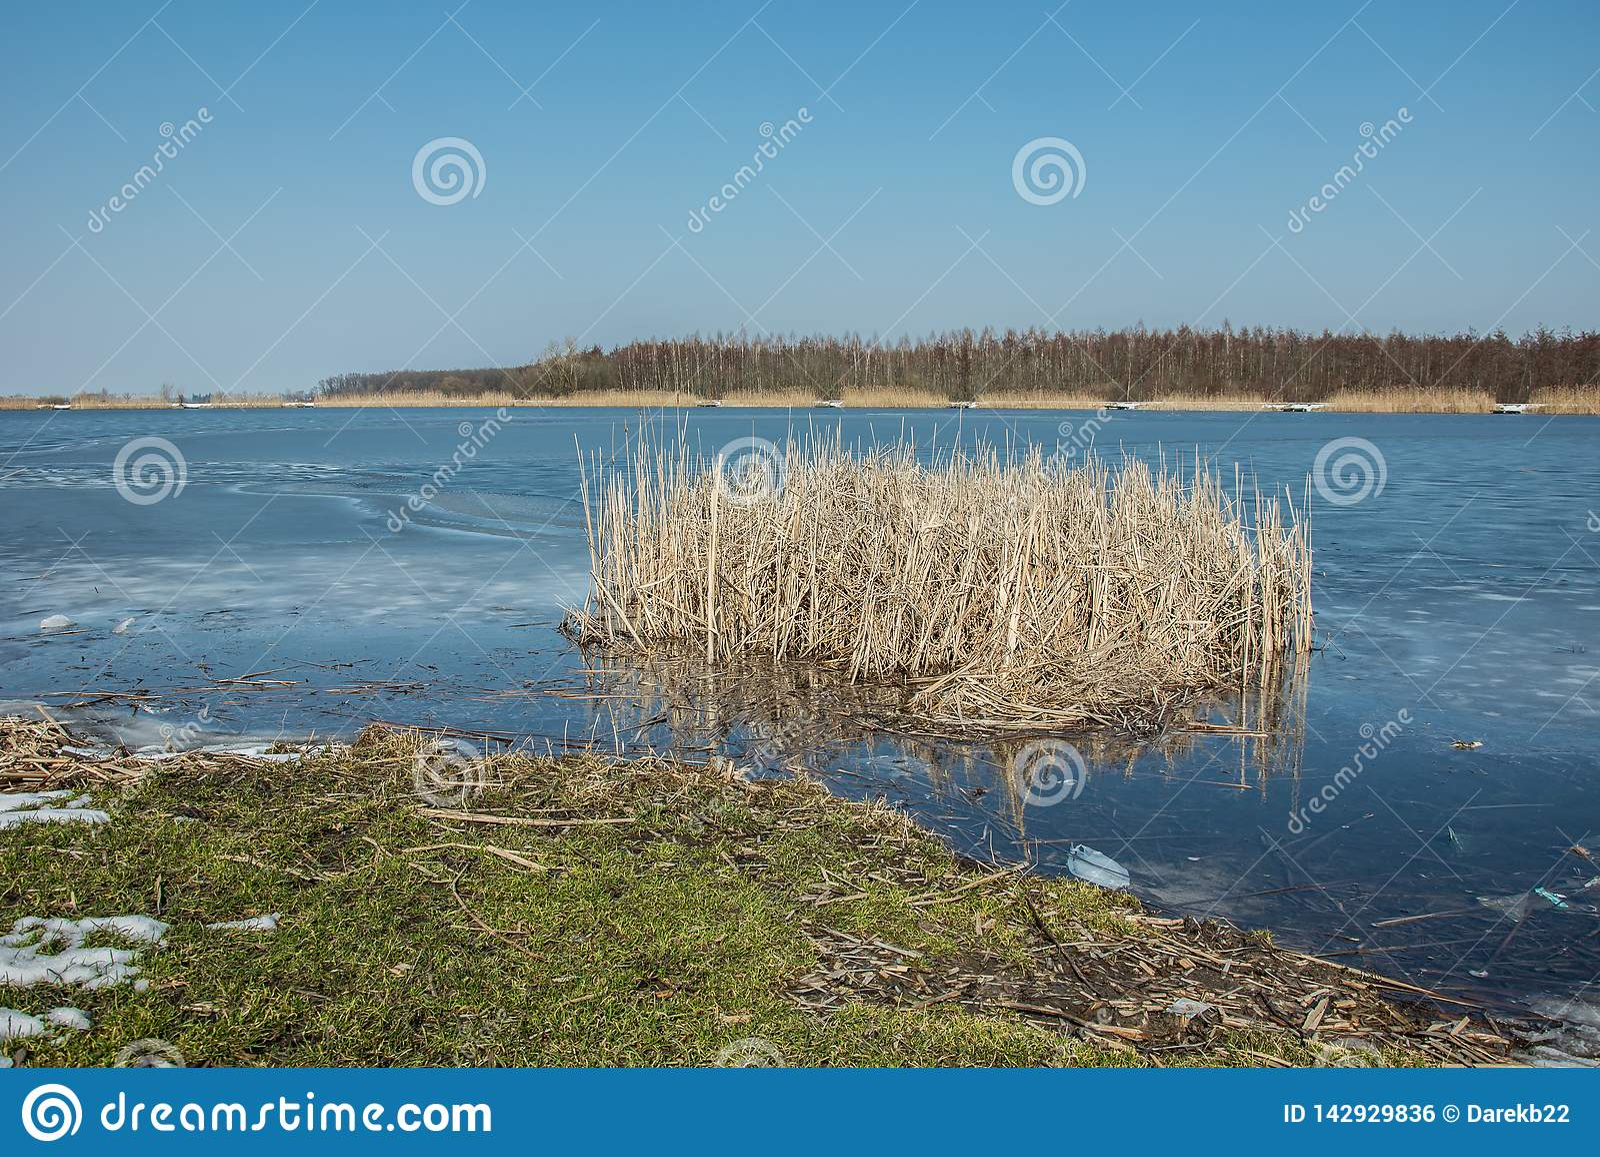 Зеленая трава на краю замороженного озера и тростников Горизонт и голубое небо